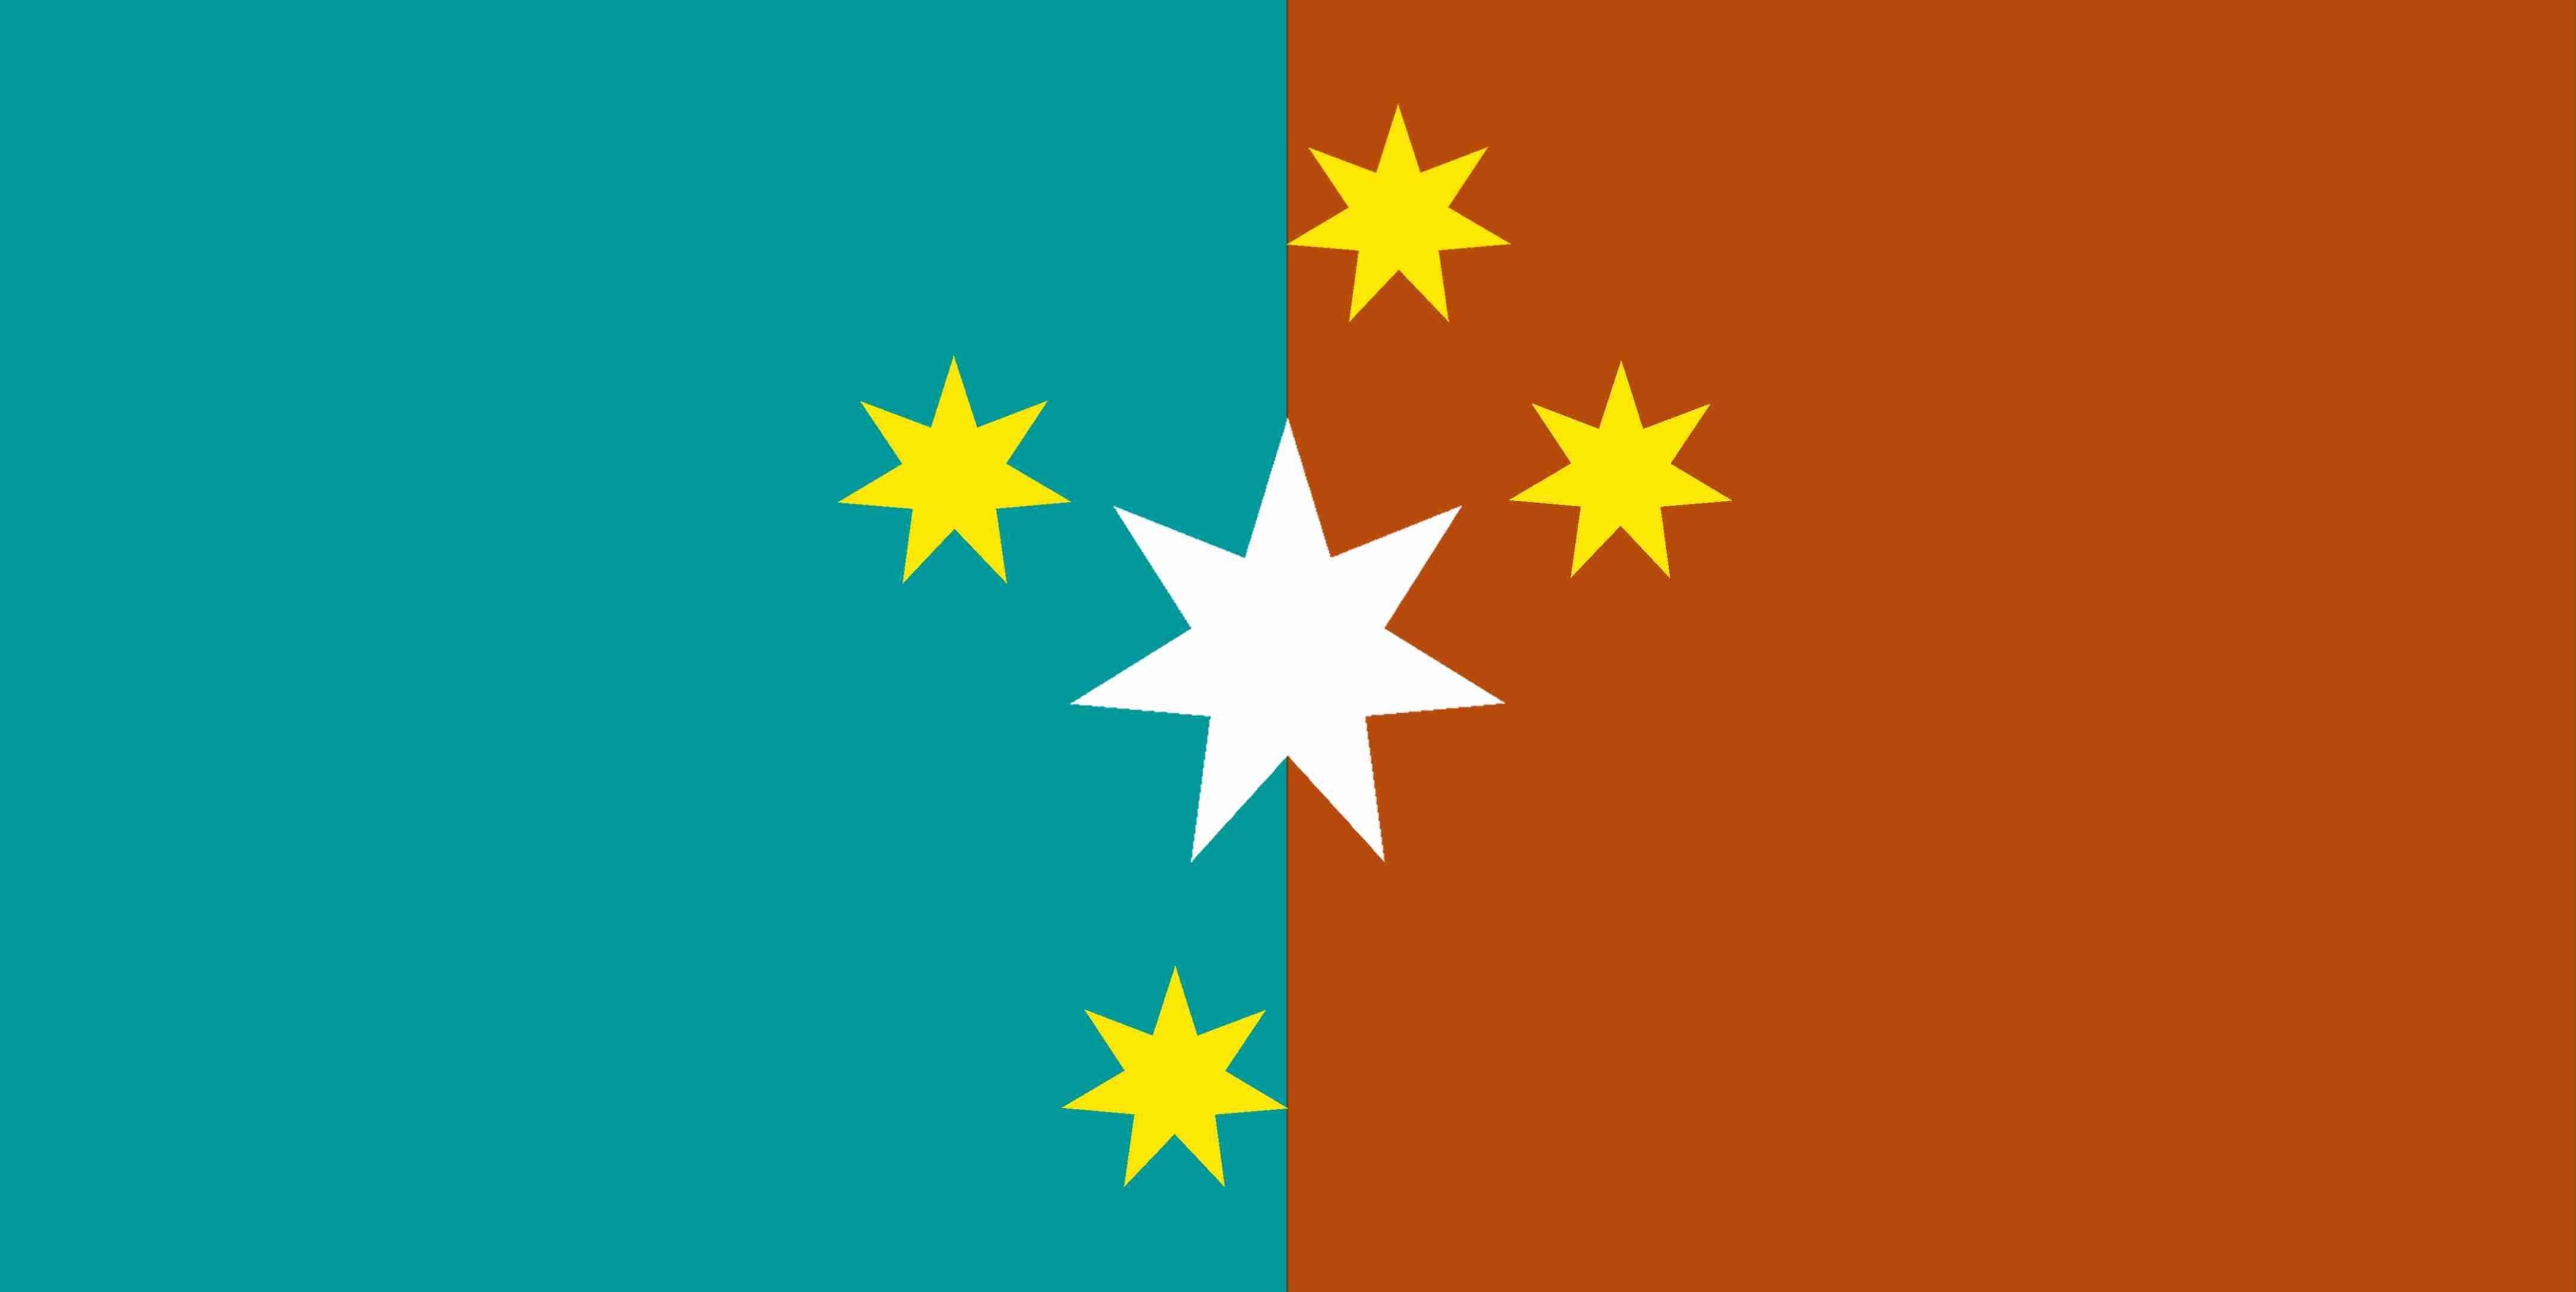 New Australian Flag Design Series Ulurusky17 New Goldsc Cs Turqblue Redochre Australian Flags Australian Flag Ideas Flag